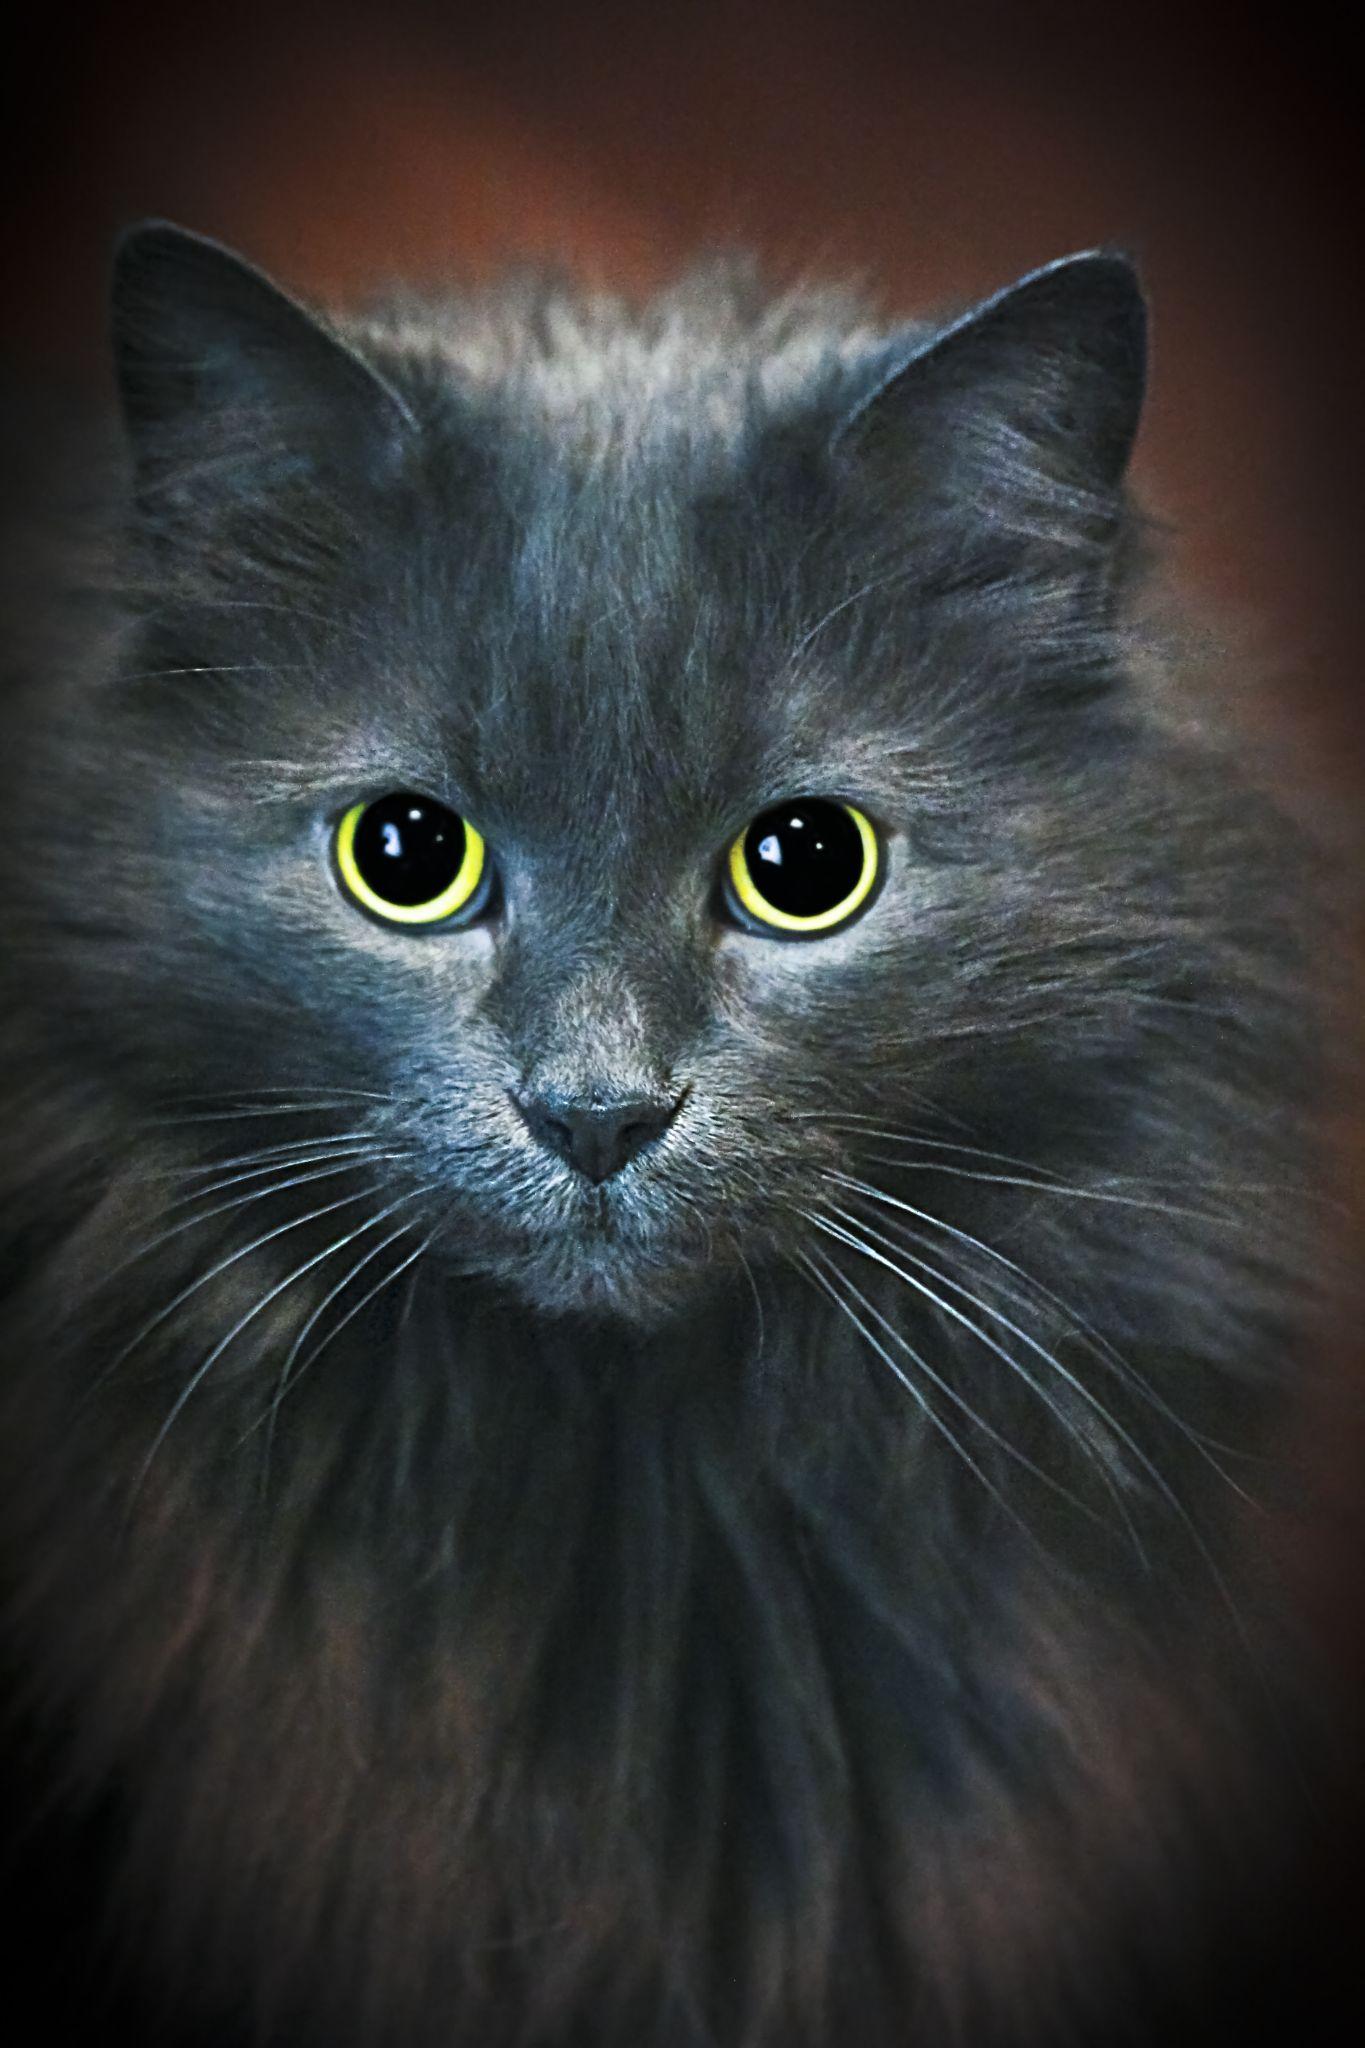 Beautiful Eyes by Susan Farris